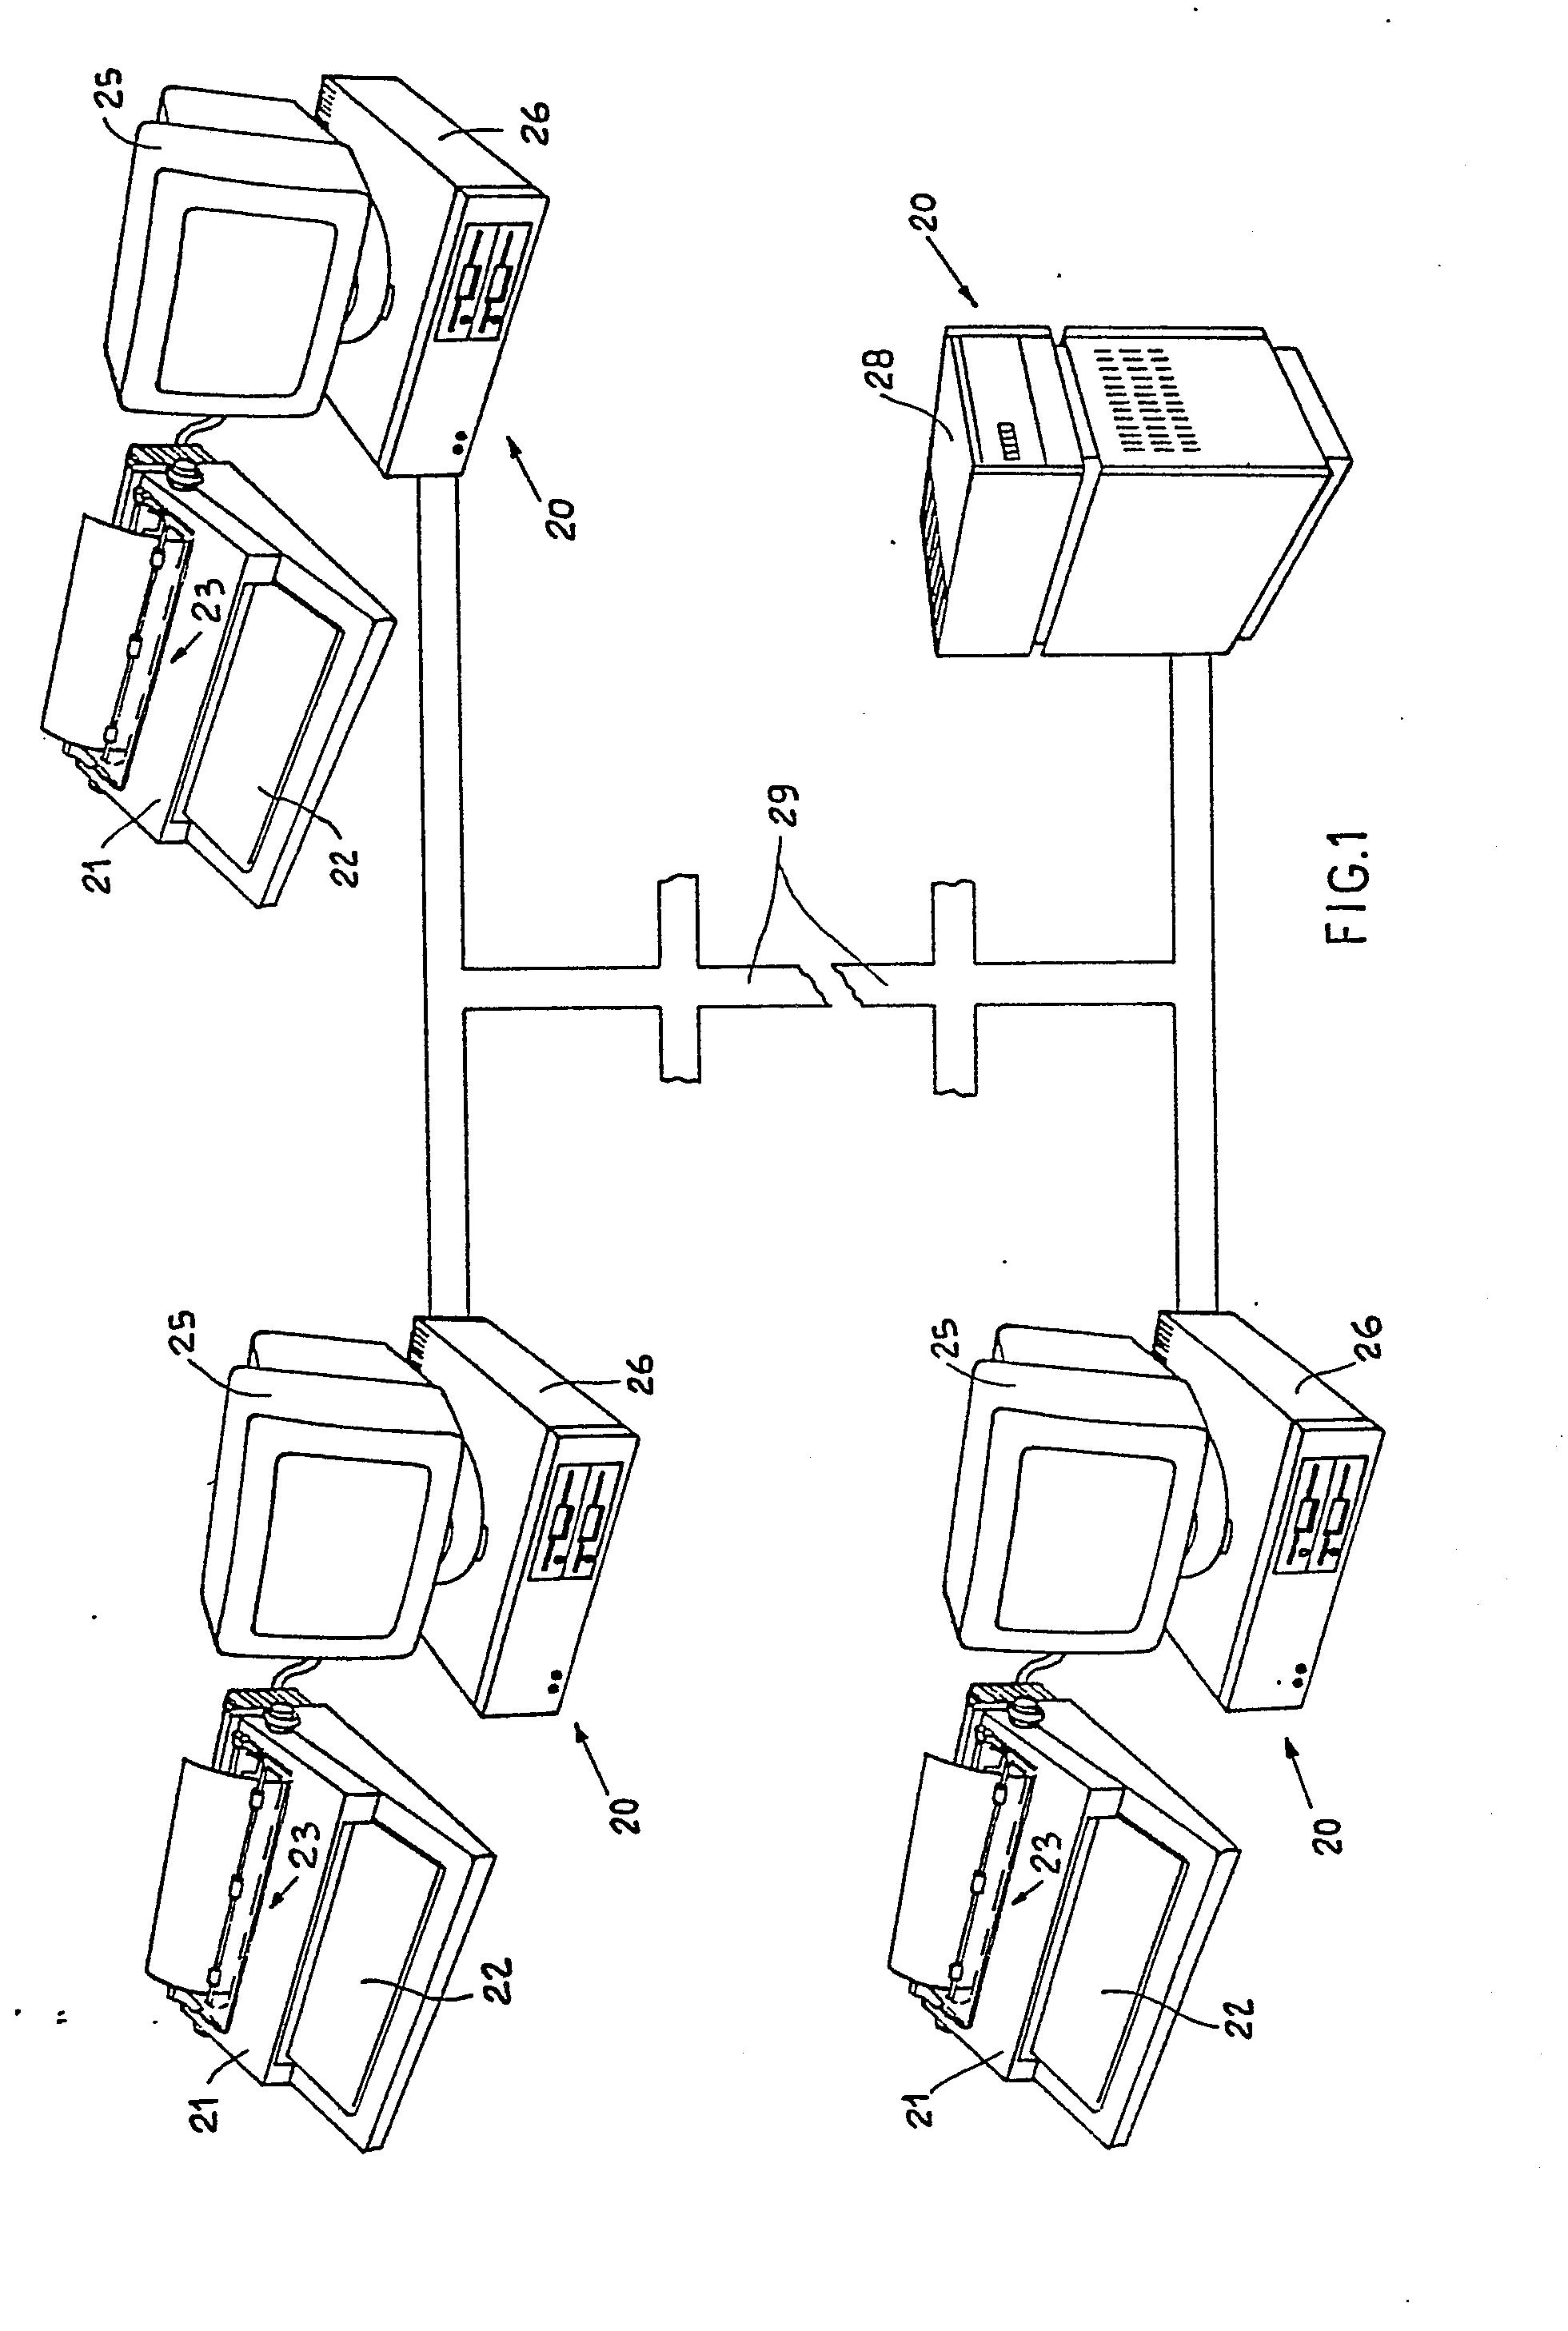 patent ep0196870a1